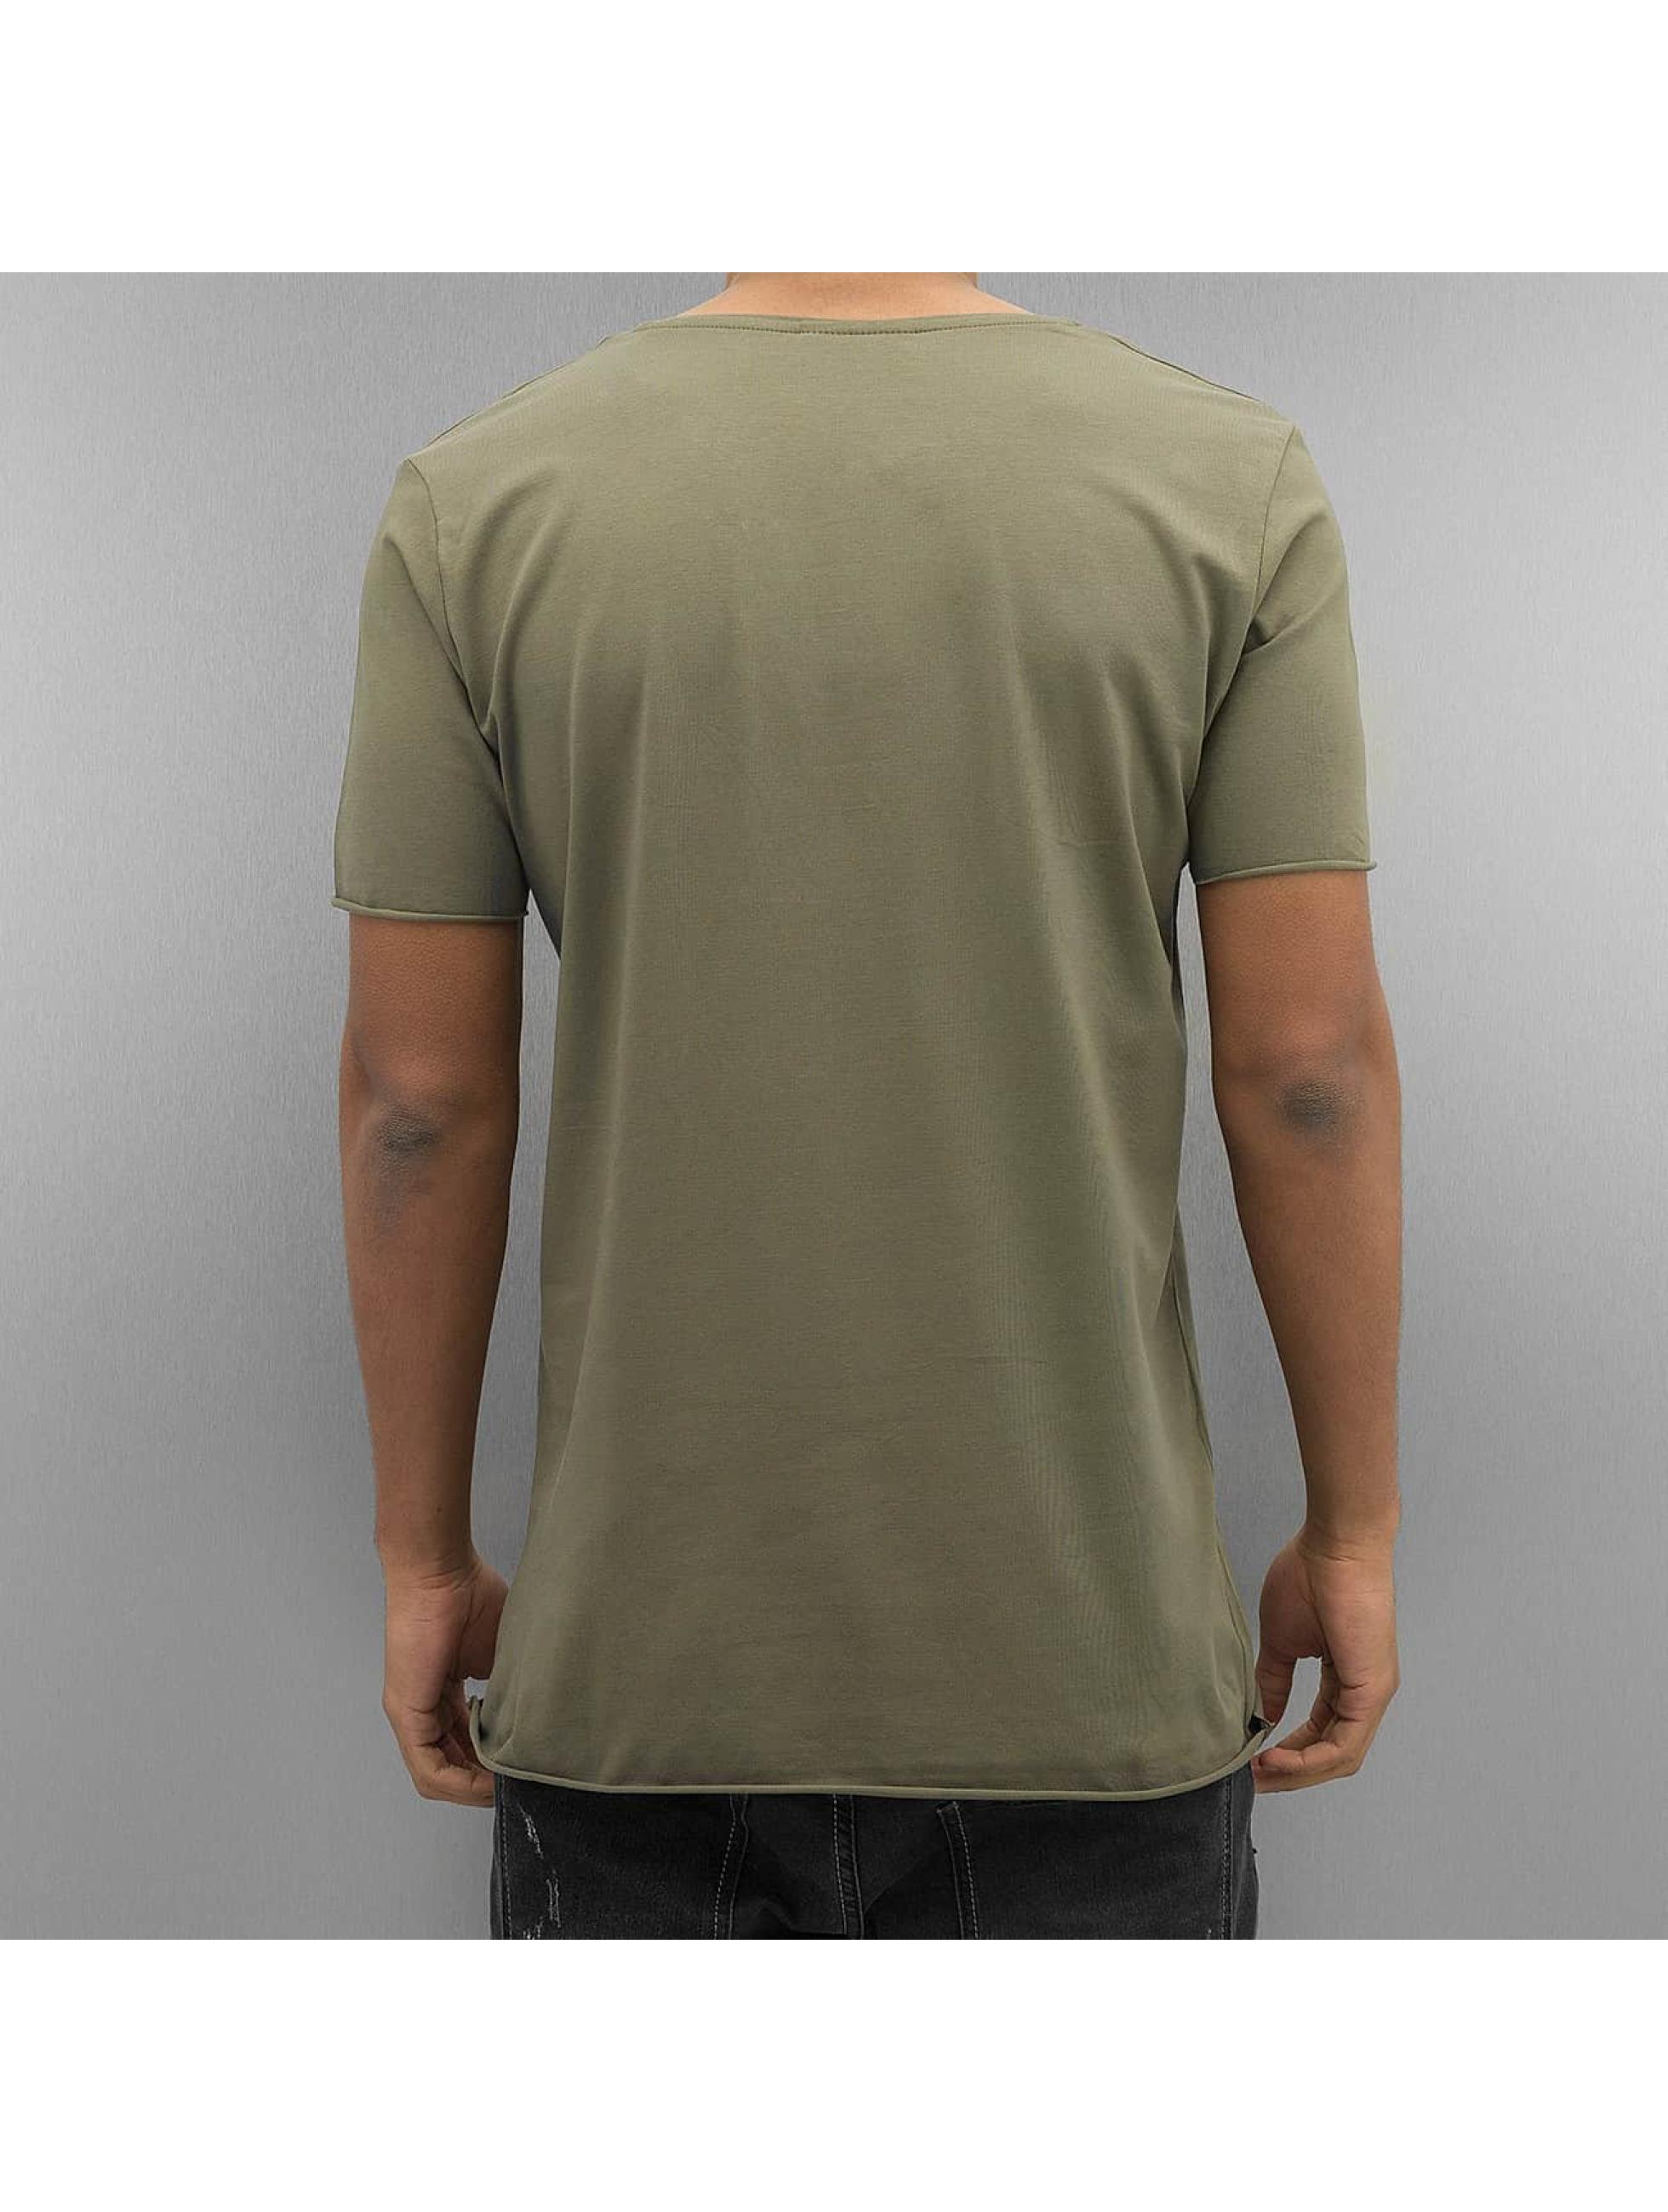 2Y T-Shirty Buy Now khaki